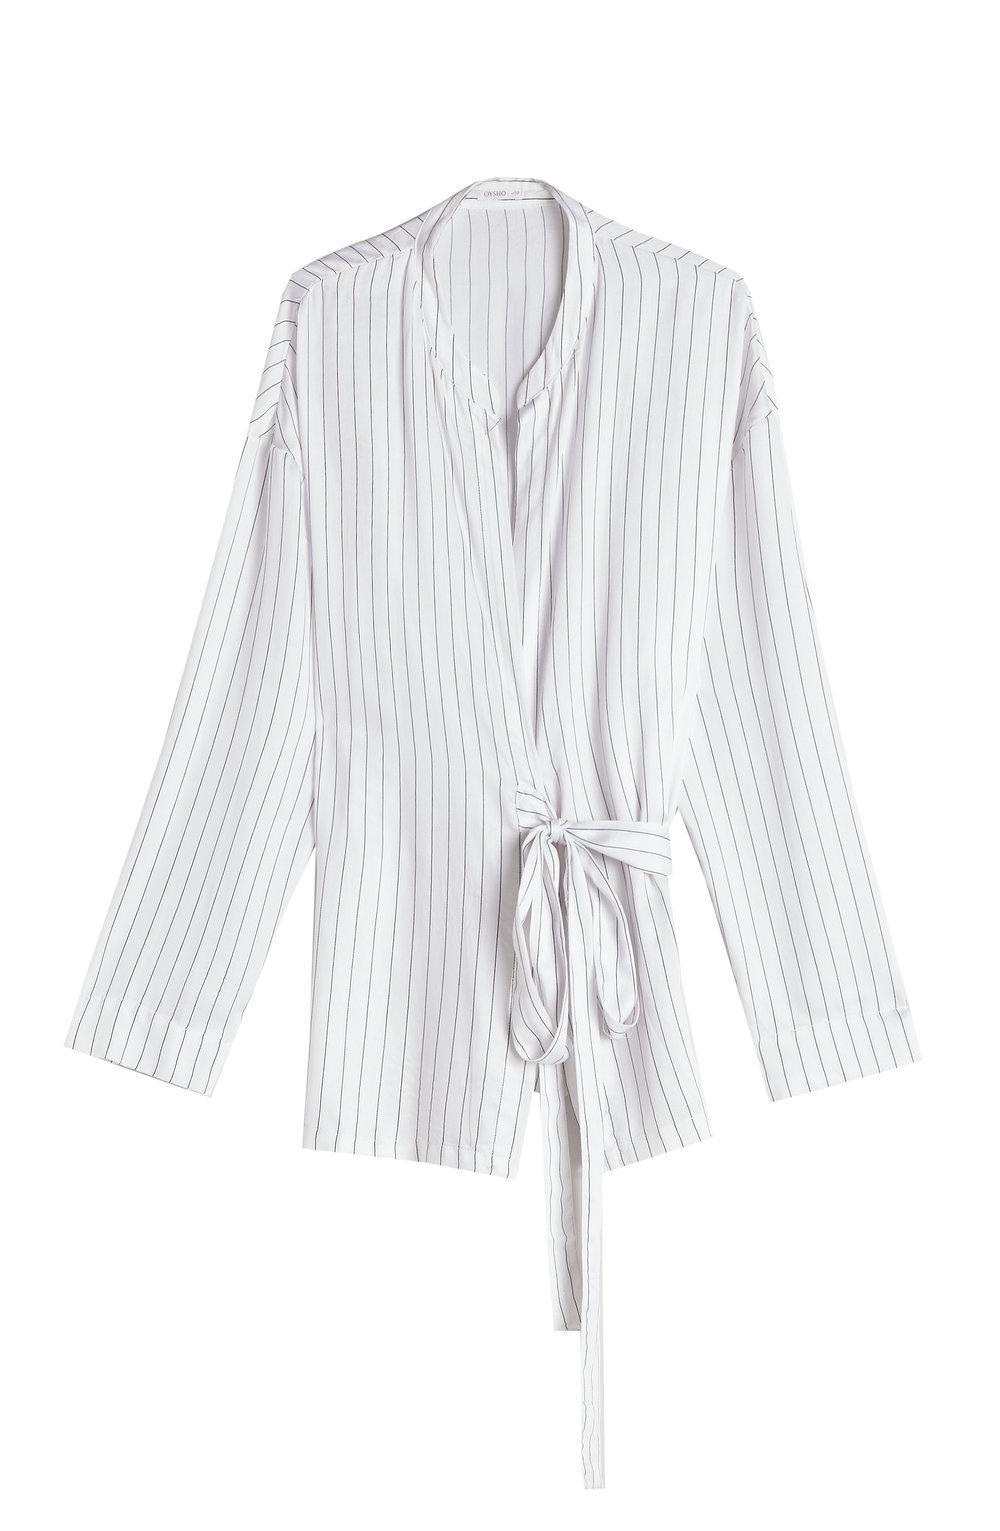 Oysho sleepwear SS17 (9).jpg